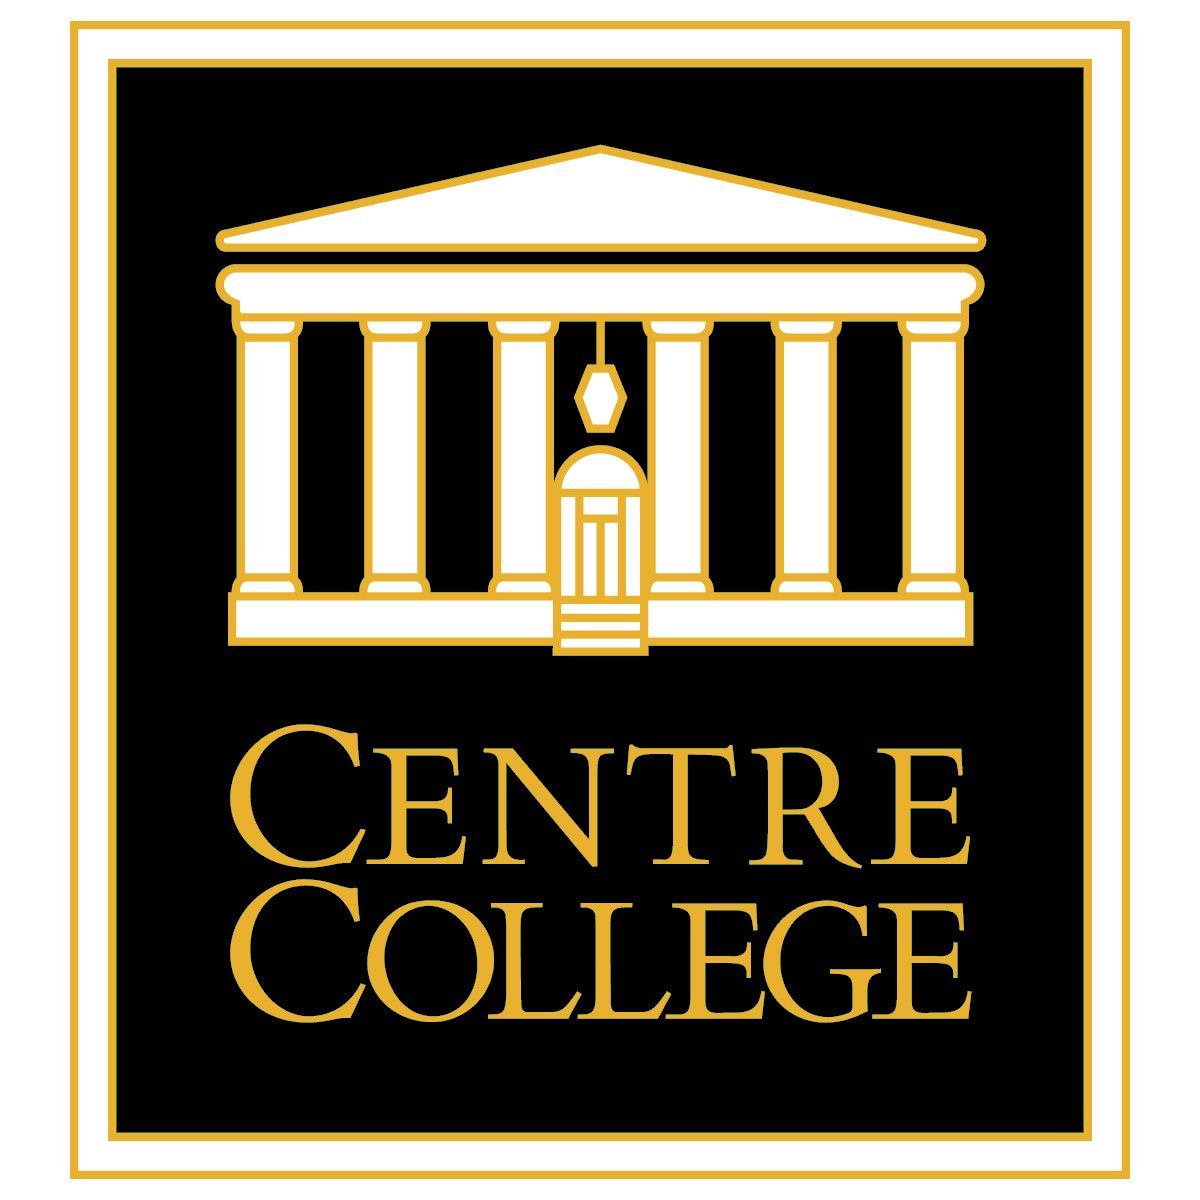 Centre college centre college college centre